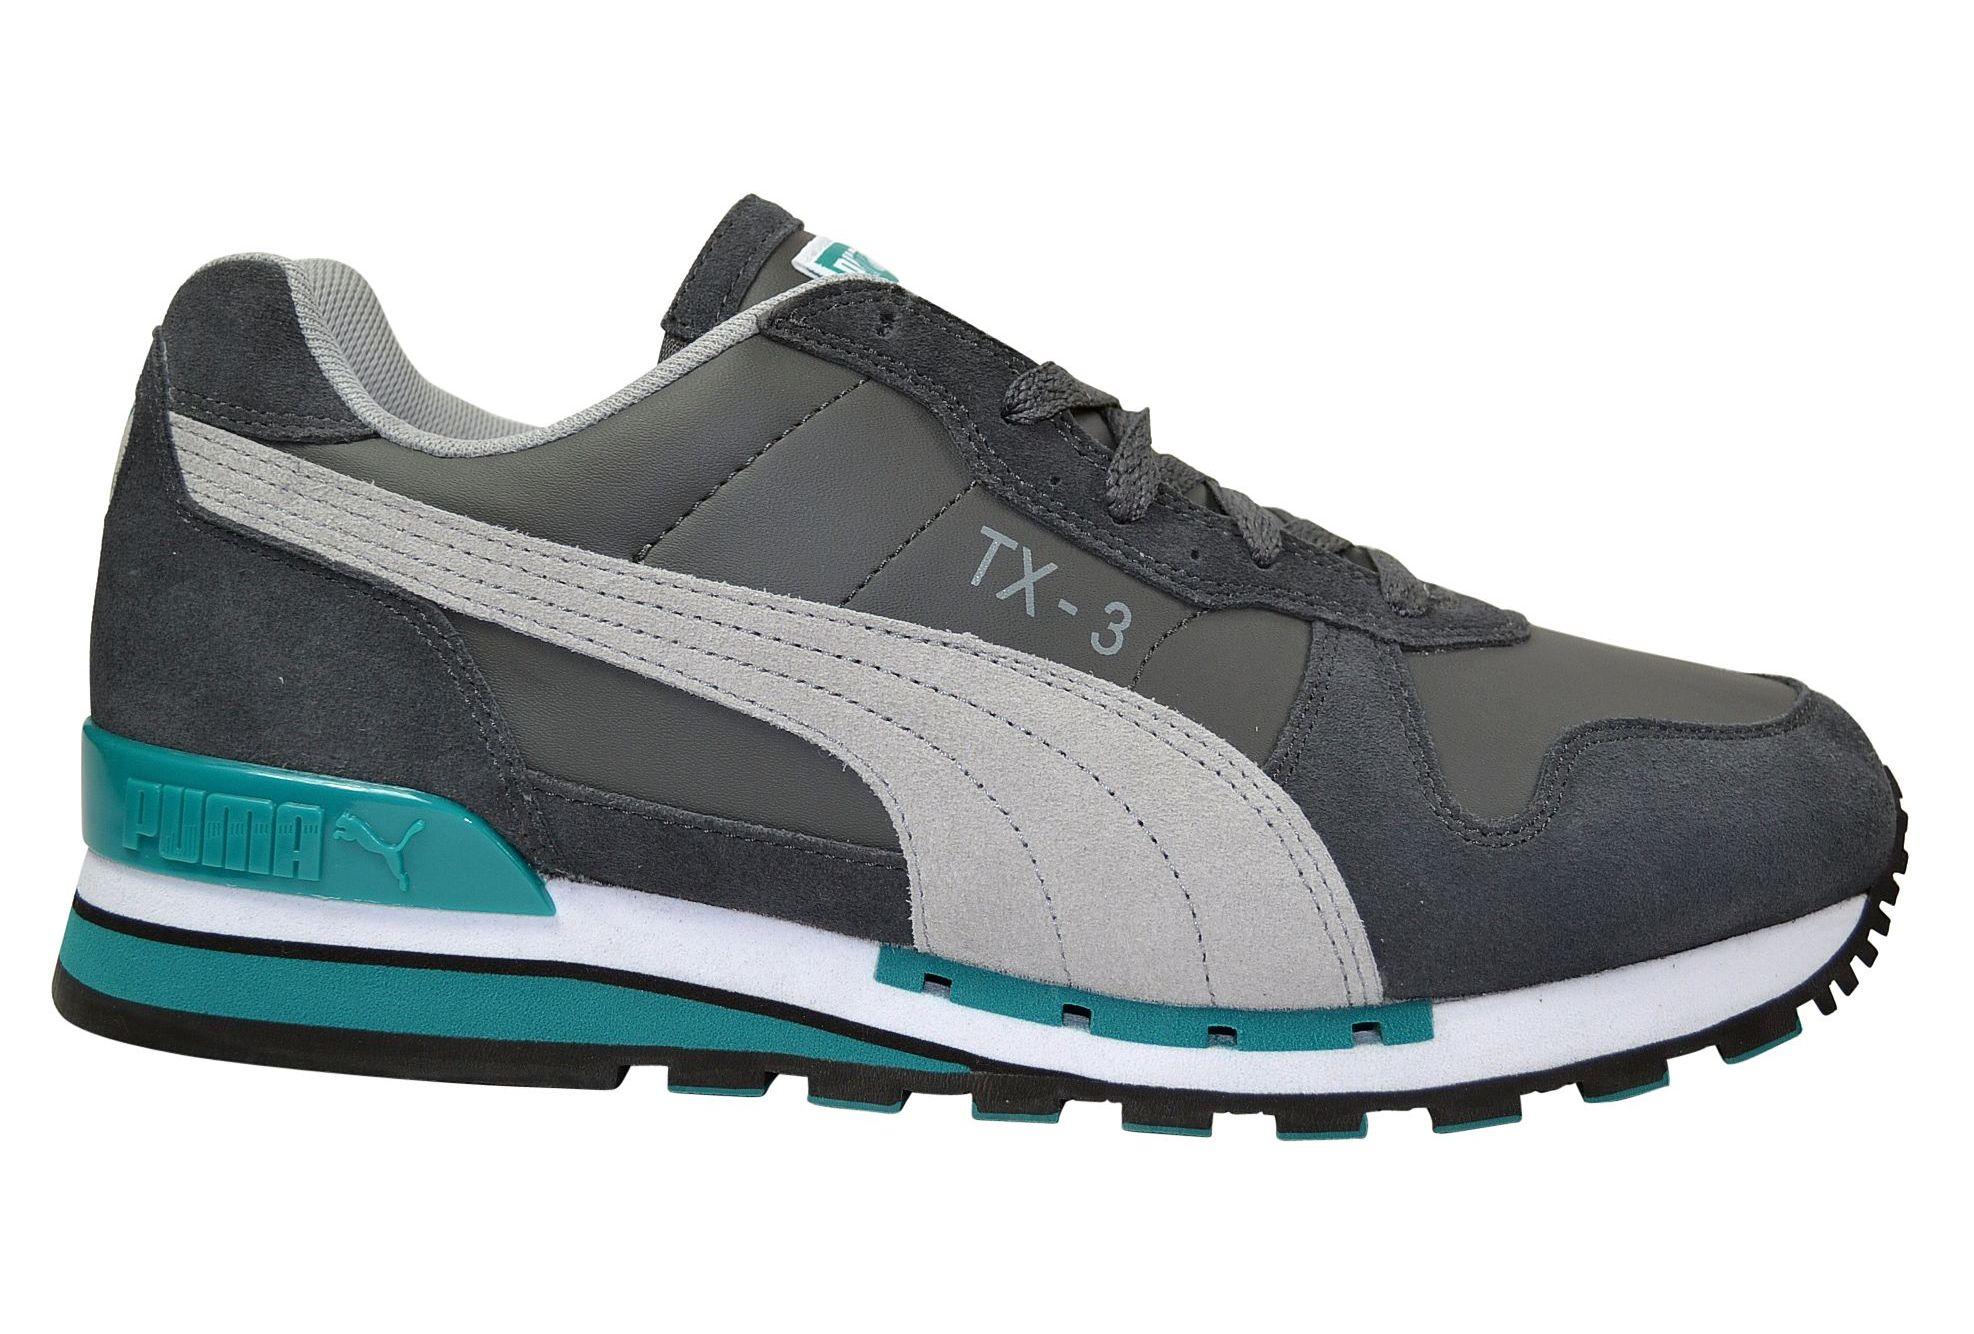 Puma TX 3 LTHR Suede limestone gray Sneaker grau 35567403 Gr e 44